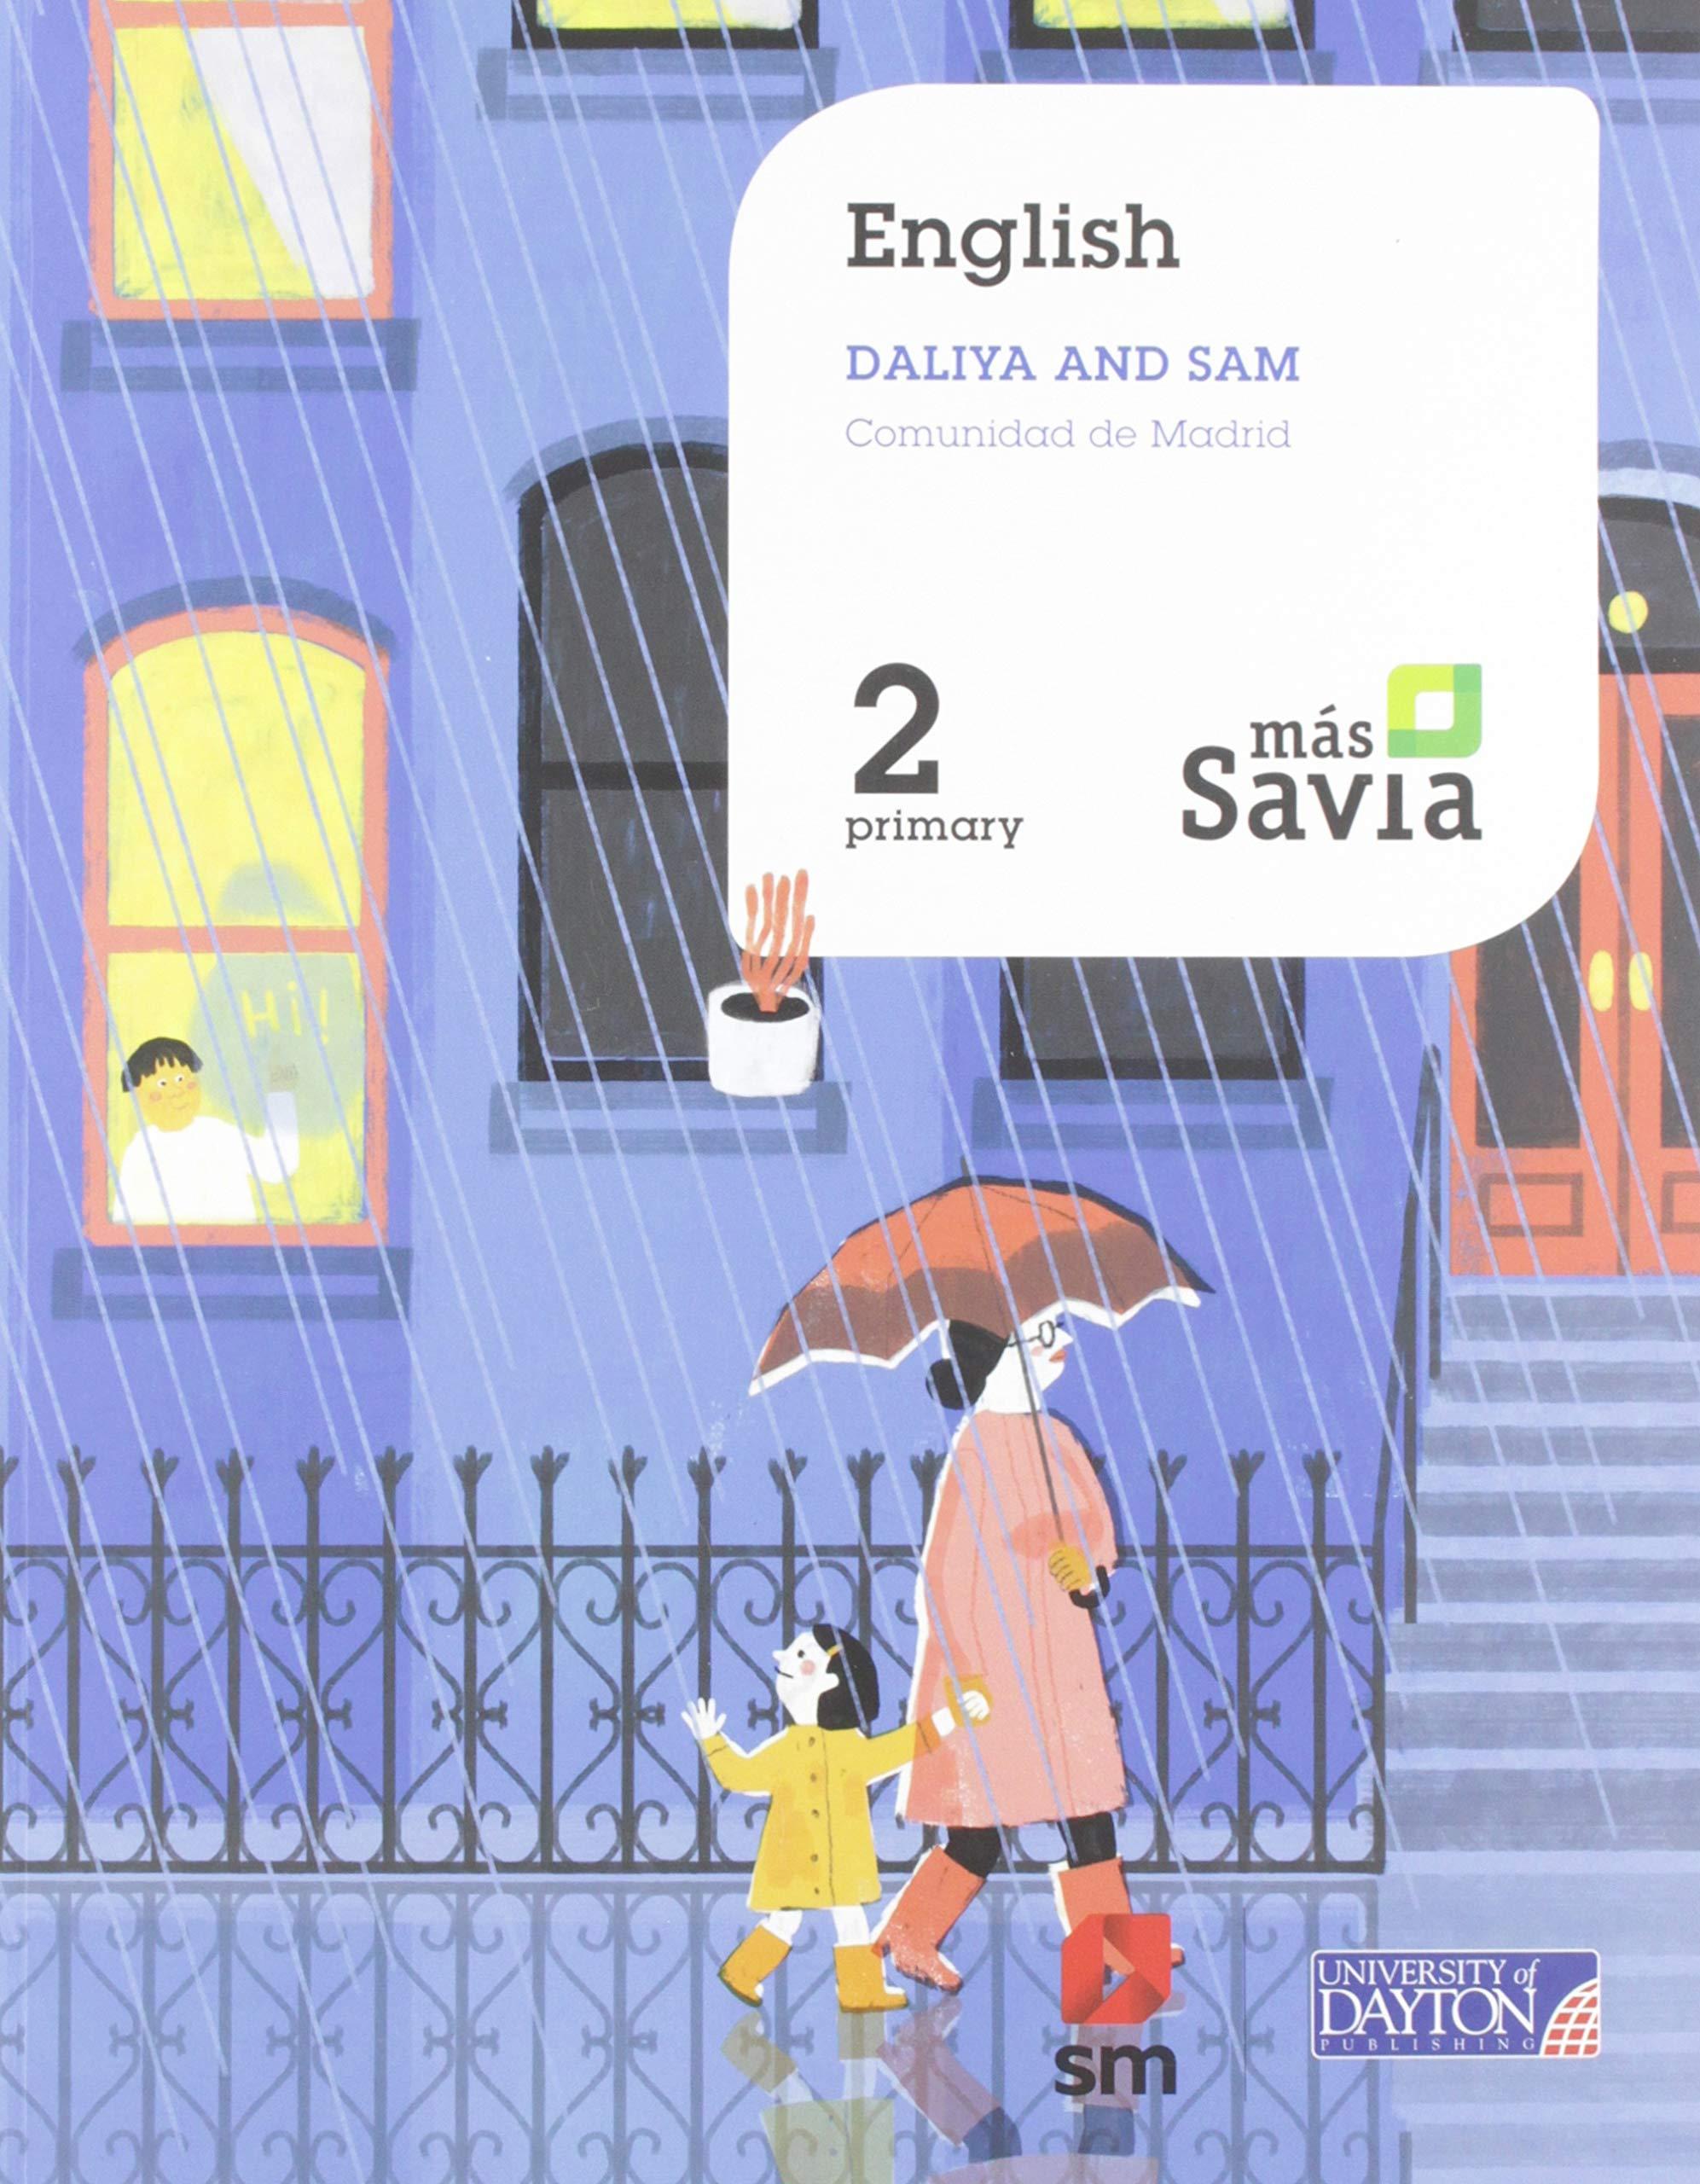 English. Sam and Daliya. 2 Primary. Más Savia. Madrid ...